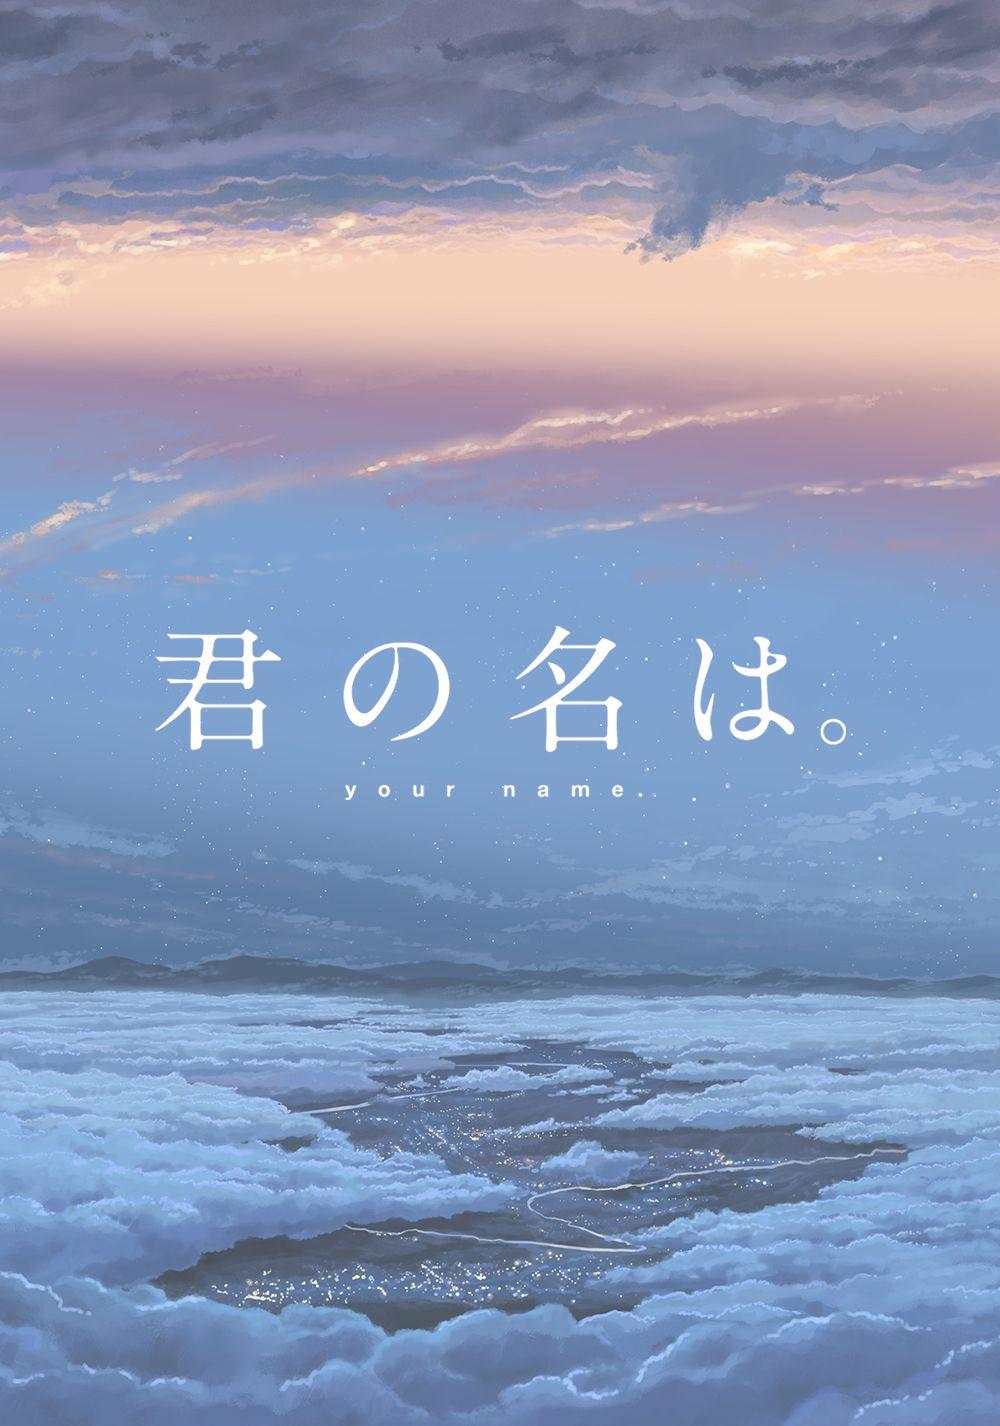 Picture Id 143474 Kimi No Na Wa Your Name Pinterest Full